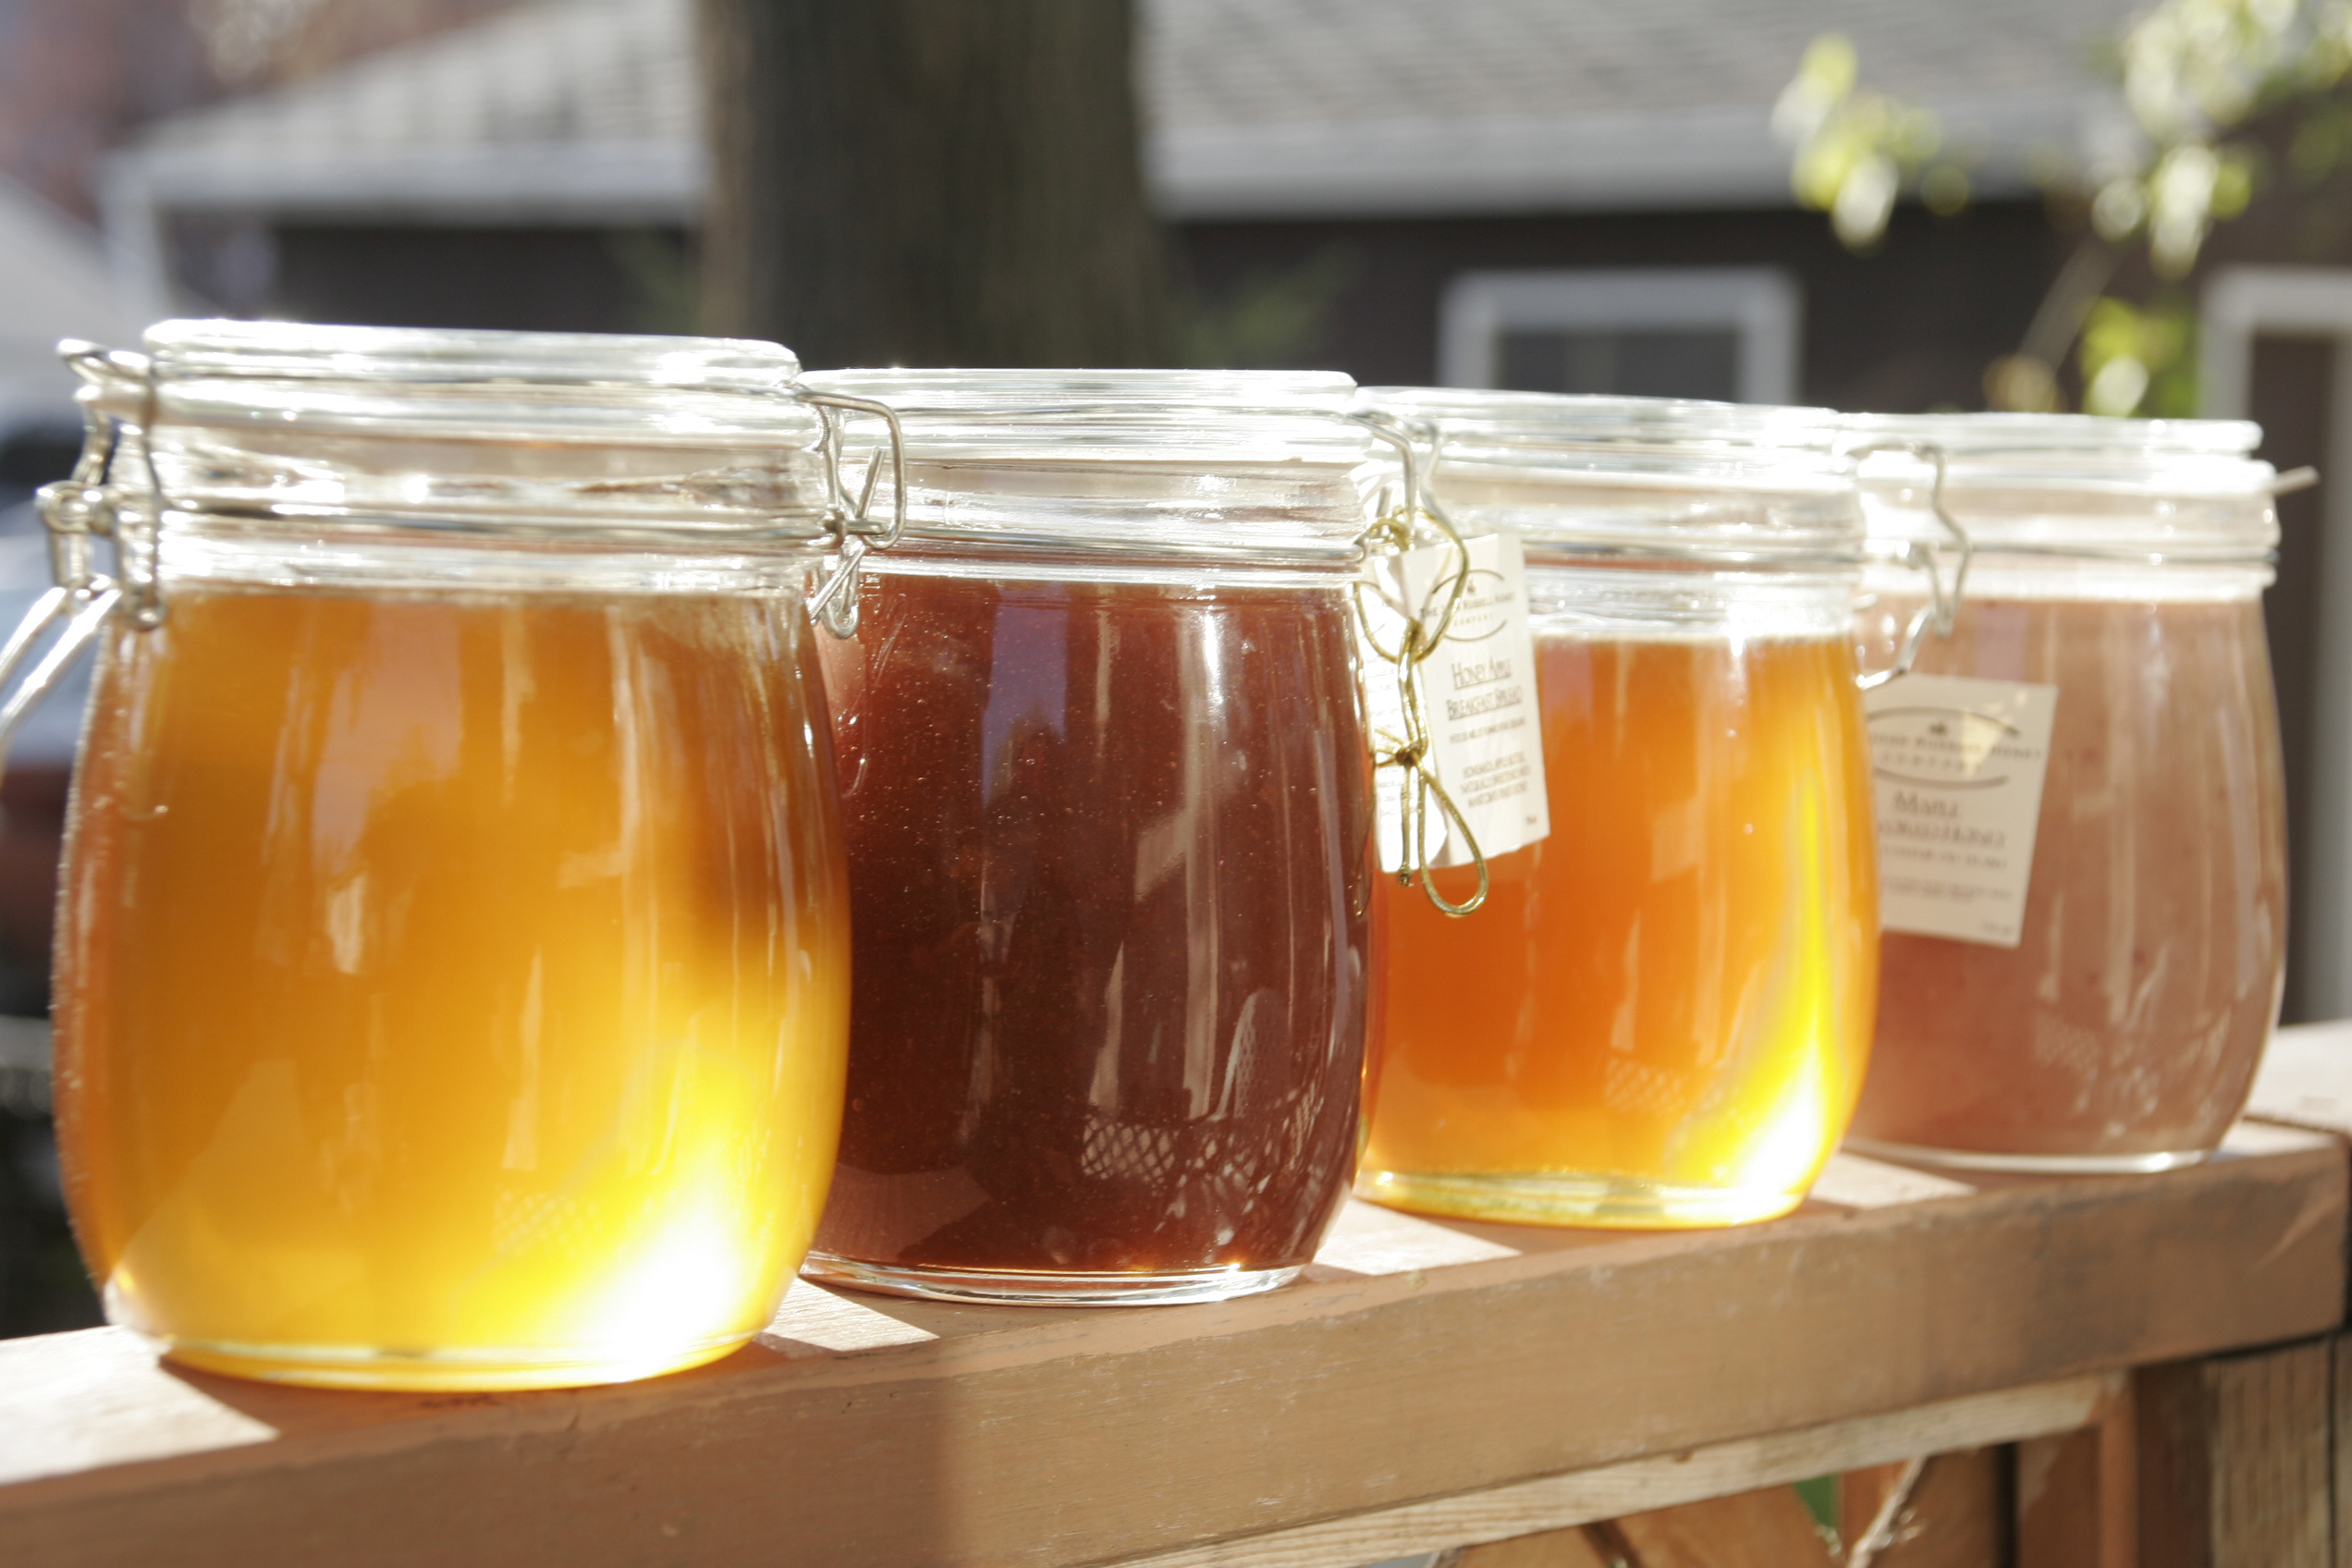 Holiday in Ikaria - Honey tasting